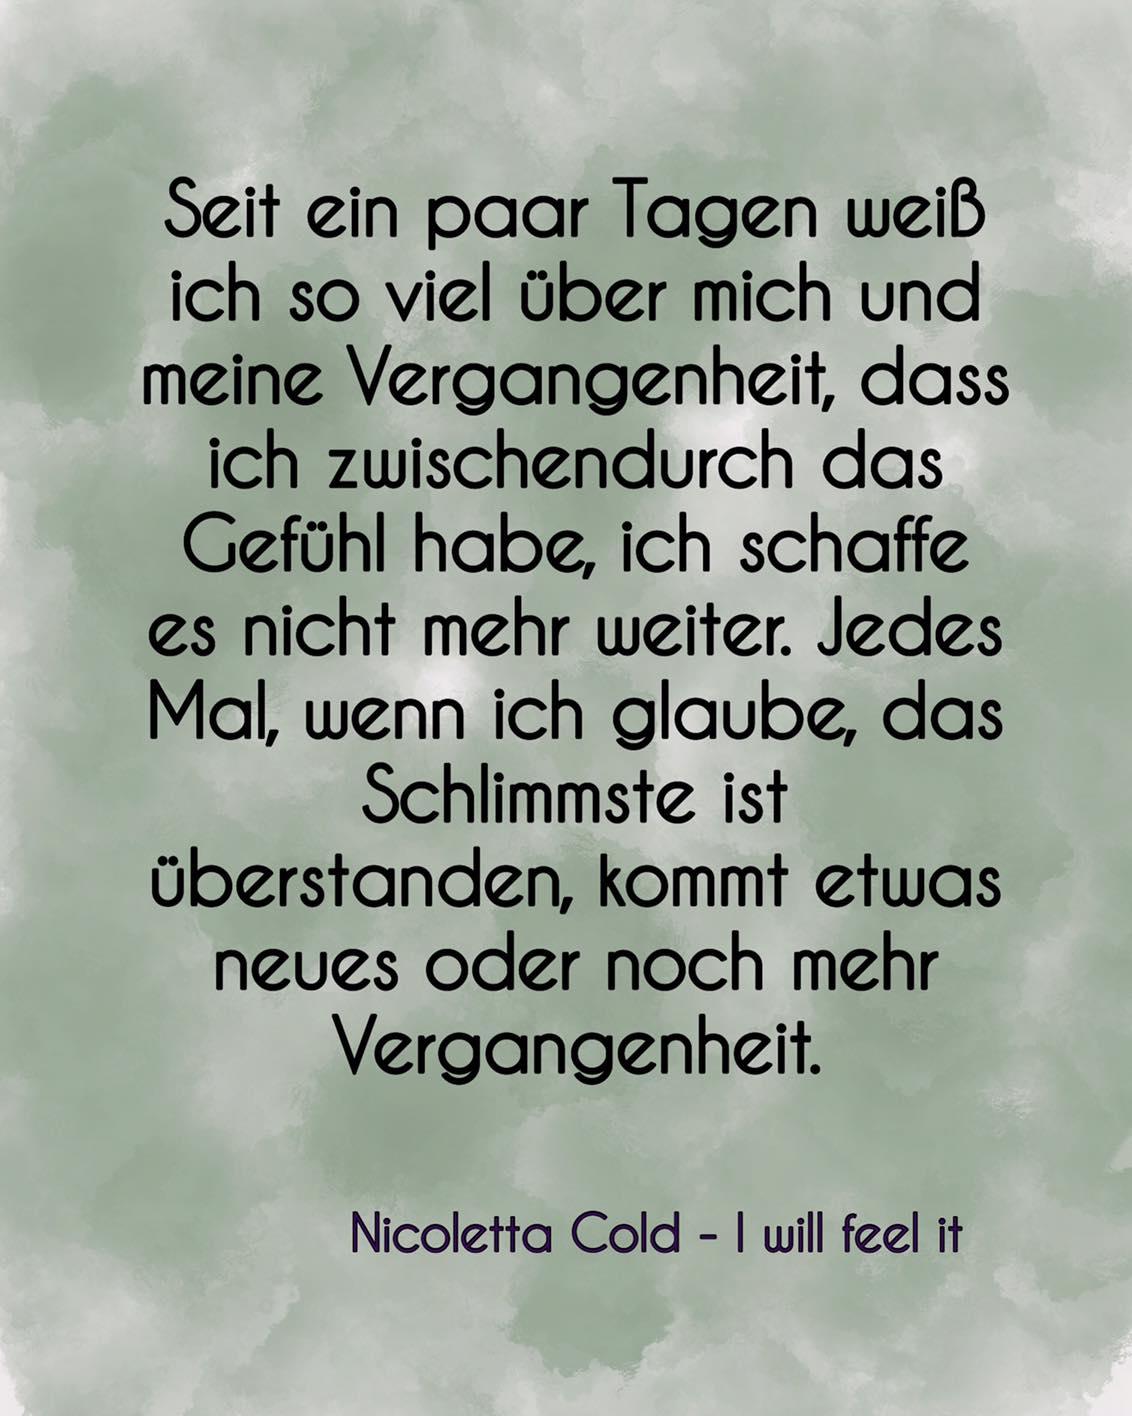 I will feel it